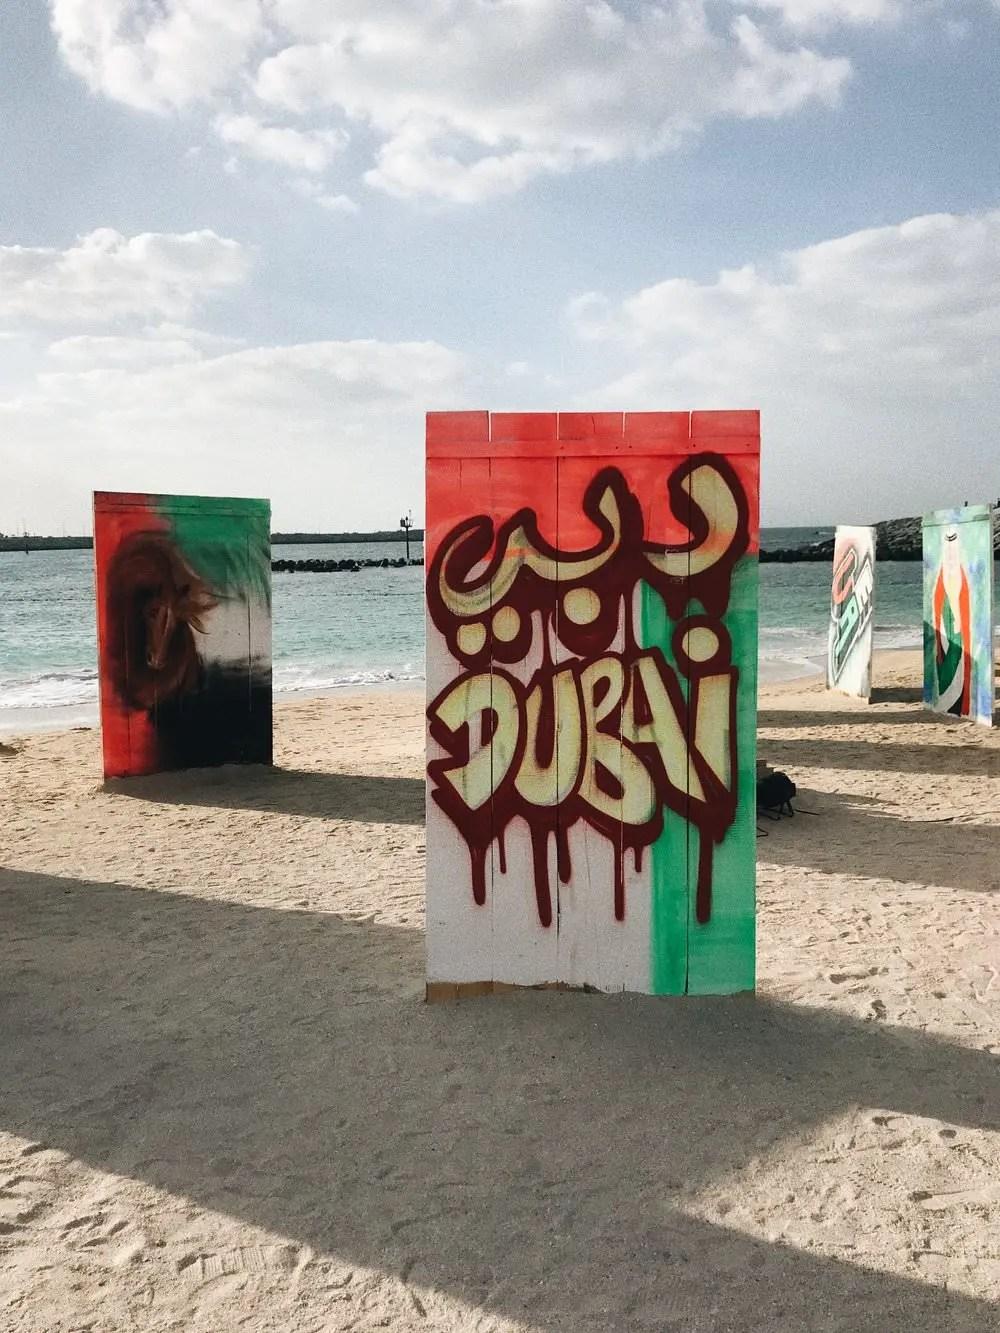 De Dubai à Abu Dhabi - Merveilles insolites 7